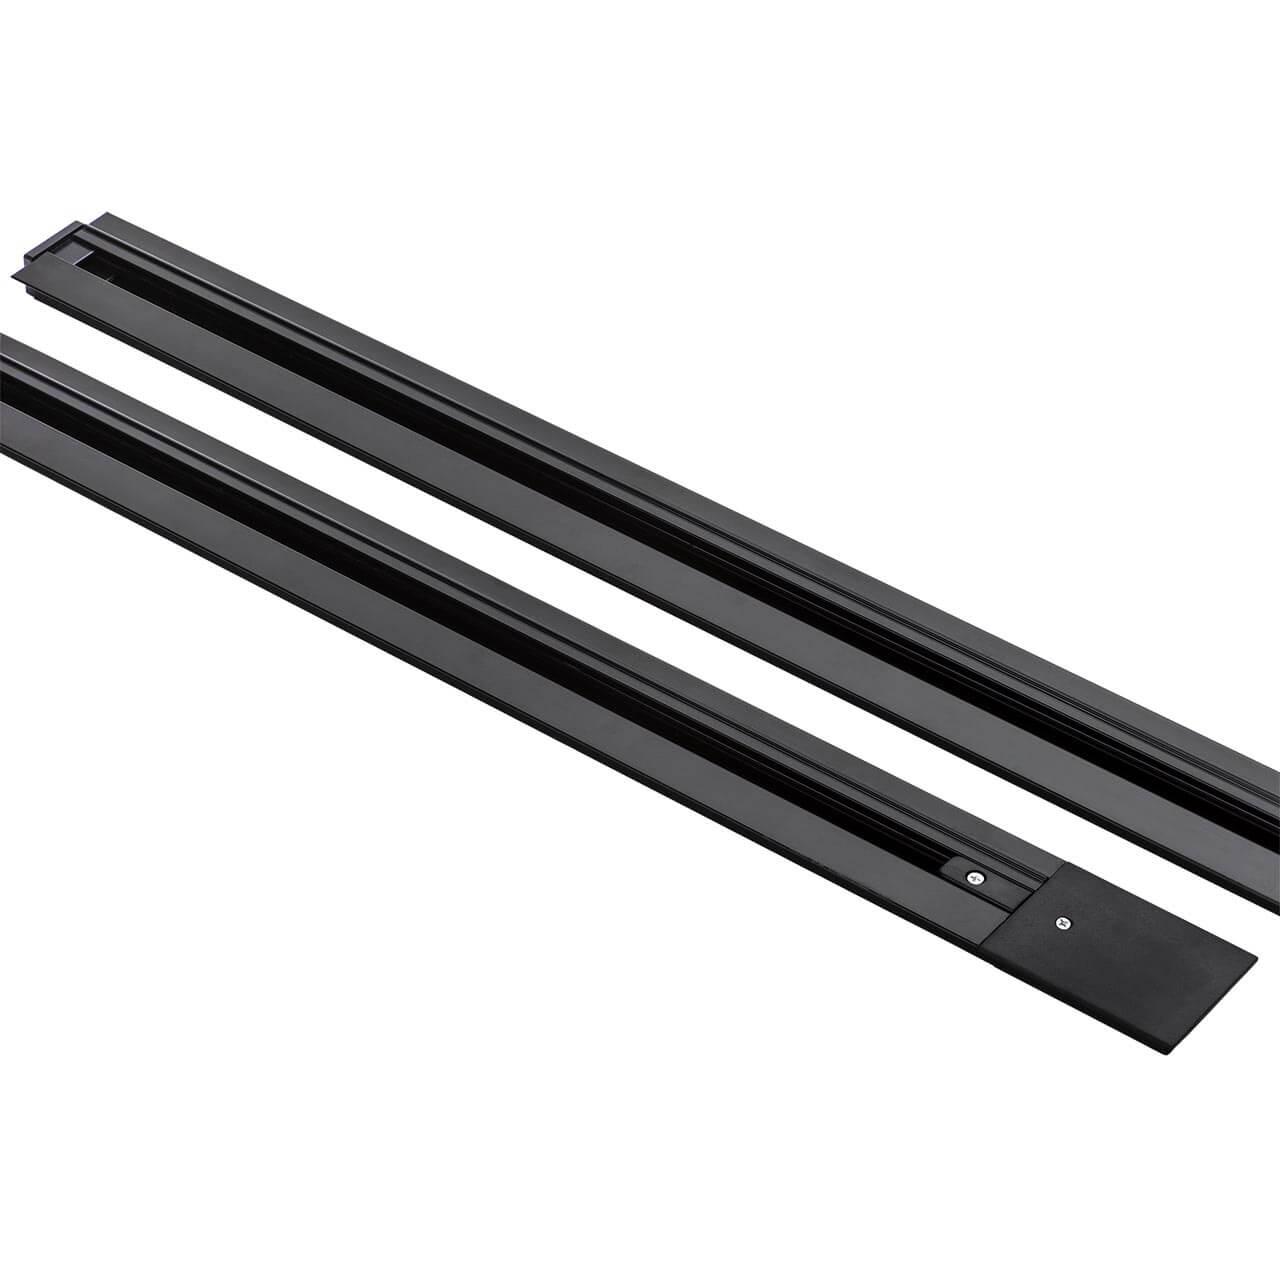 Шинопровод Lightstar 501038 Barra шинопровод однофазный lightstar barra 502027